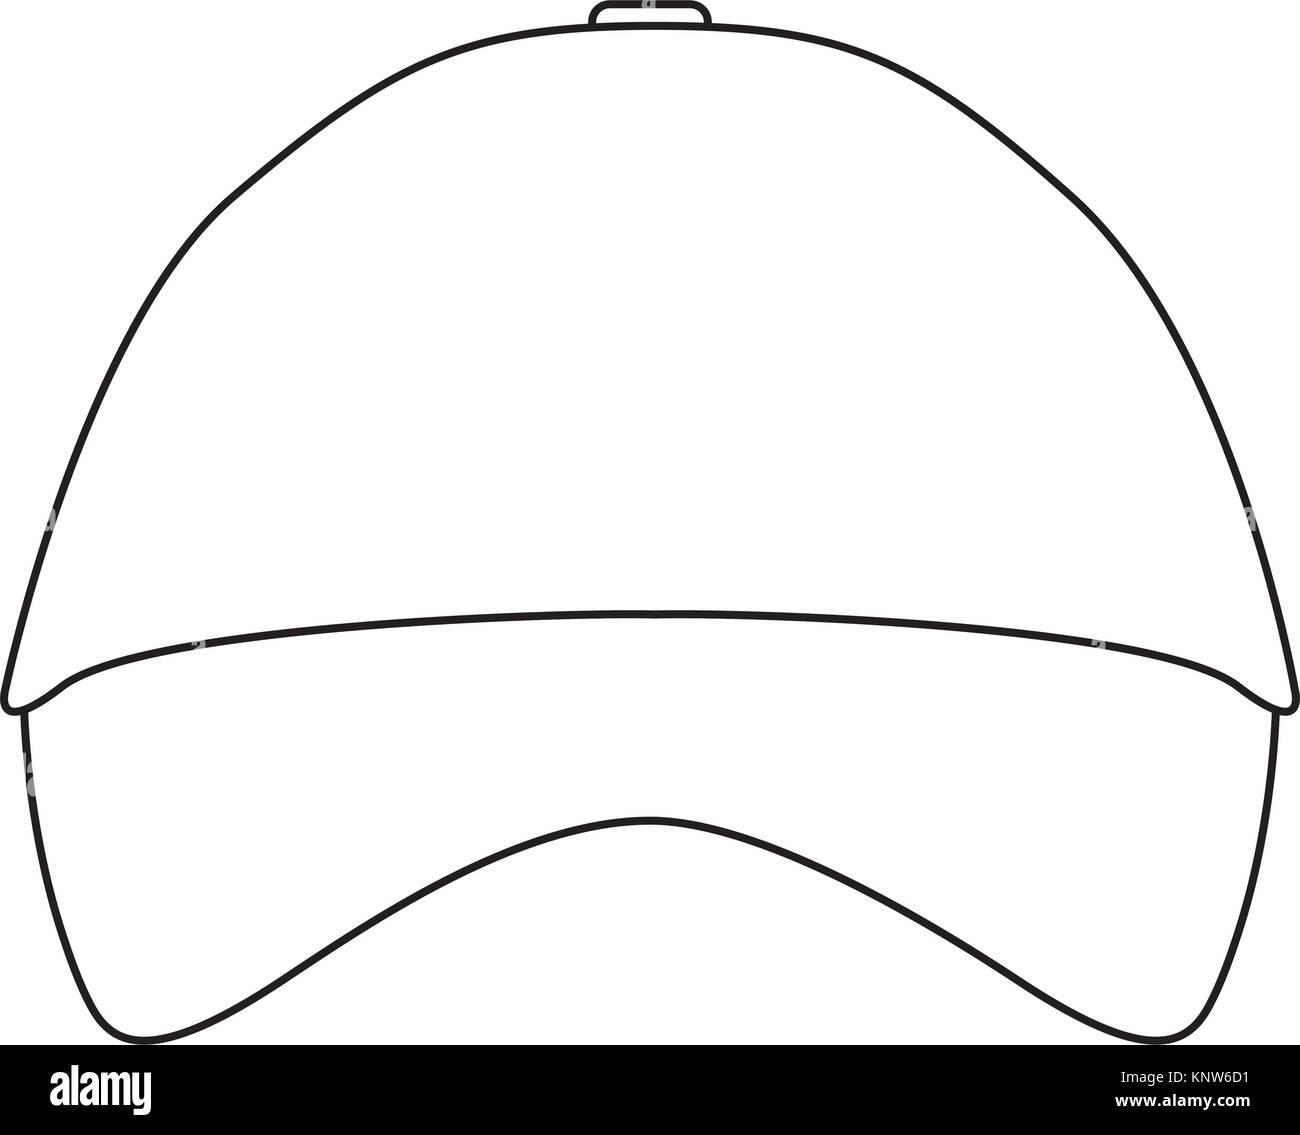 promotional souvenir baseball cap identity corporate empty template